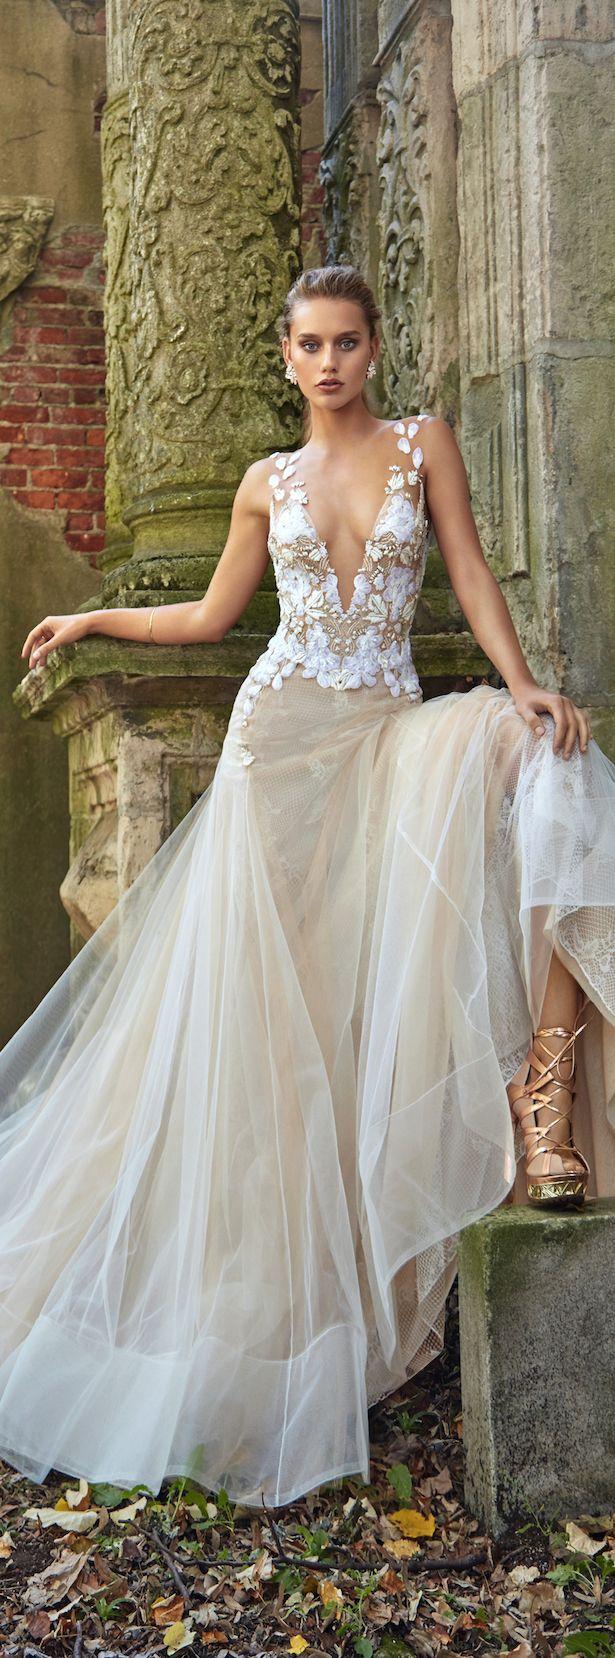 La sposa pandora wedding dress   best  Bridal Wear And Wedding  images on Pinterest